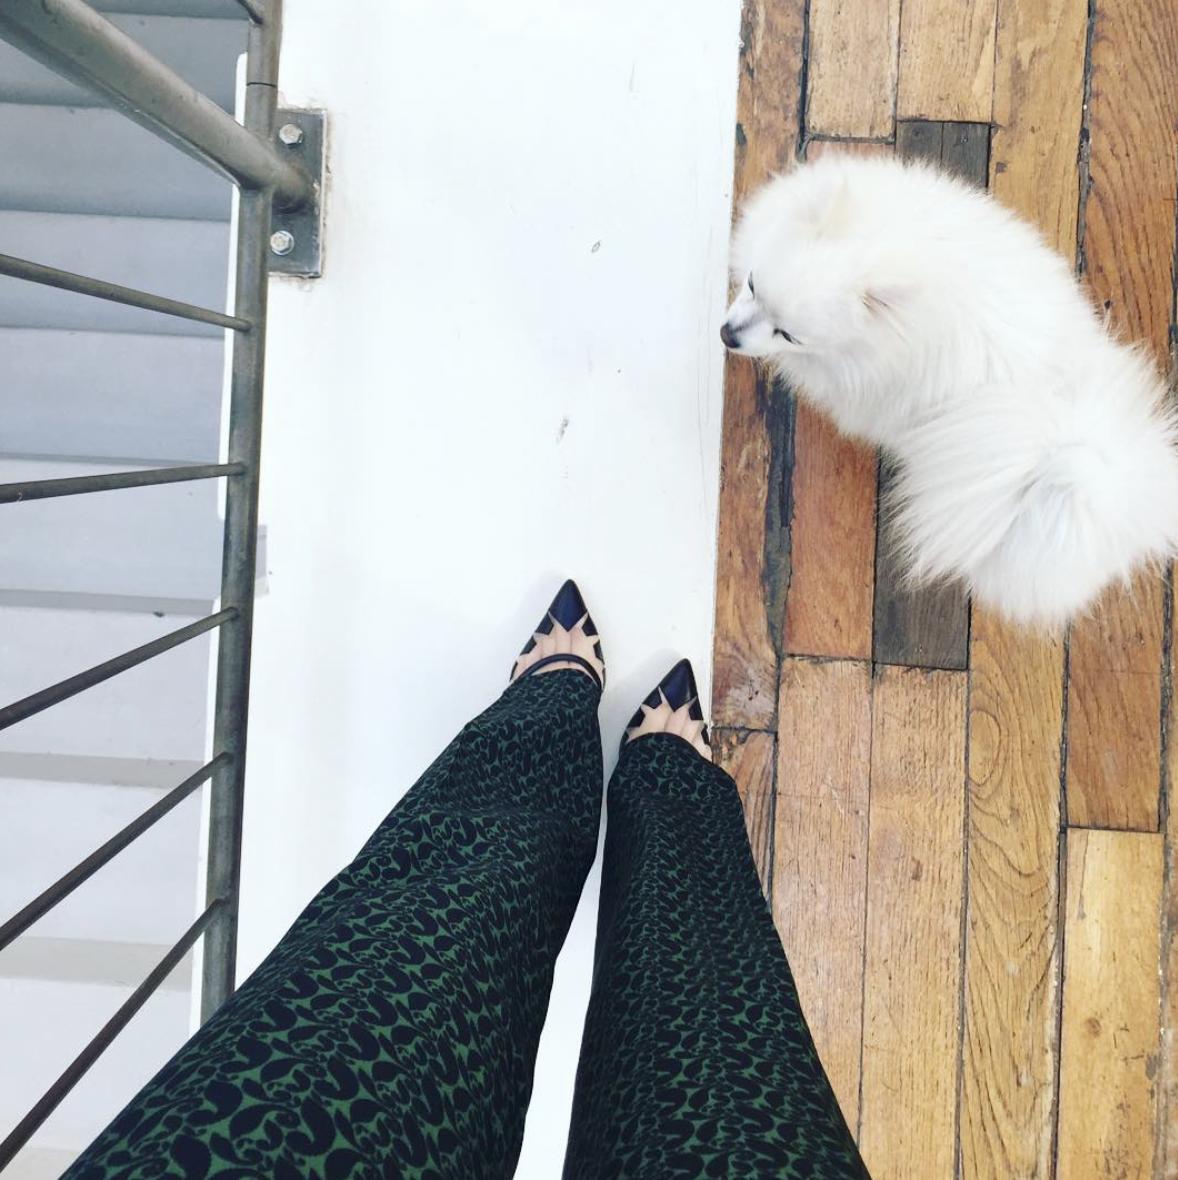 @ catherinepdv   ça va Violette? 🐩  #pfw  #puppy   #paris   #giuliettanewyork   #girlinBC